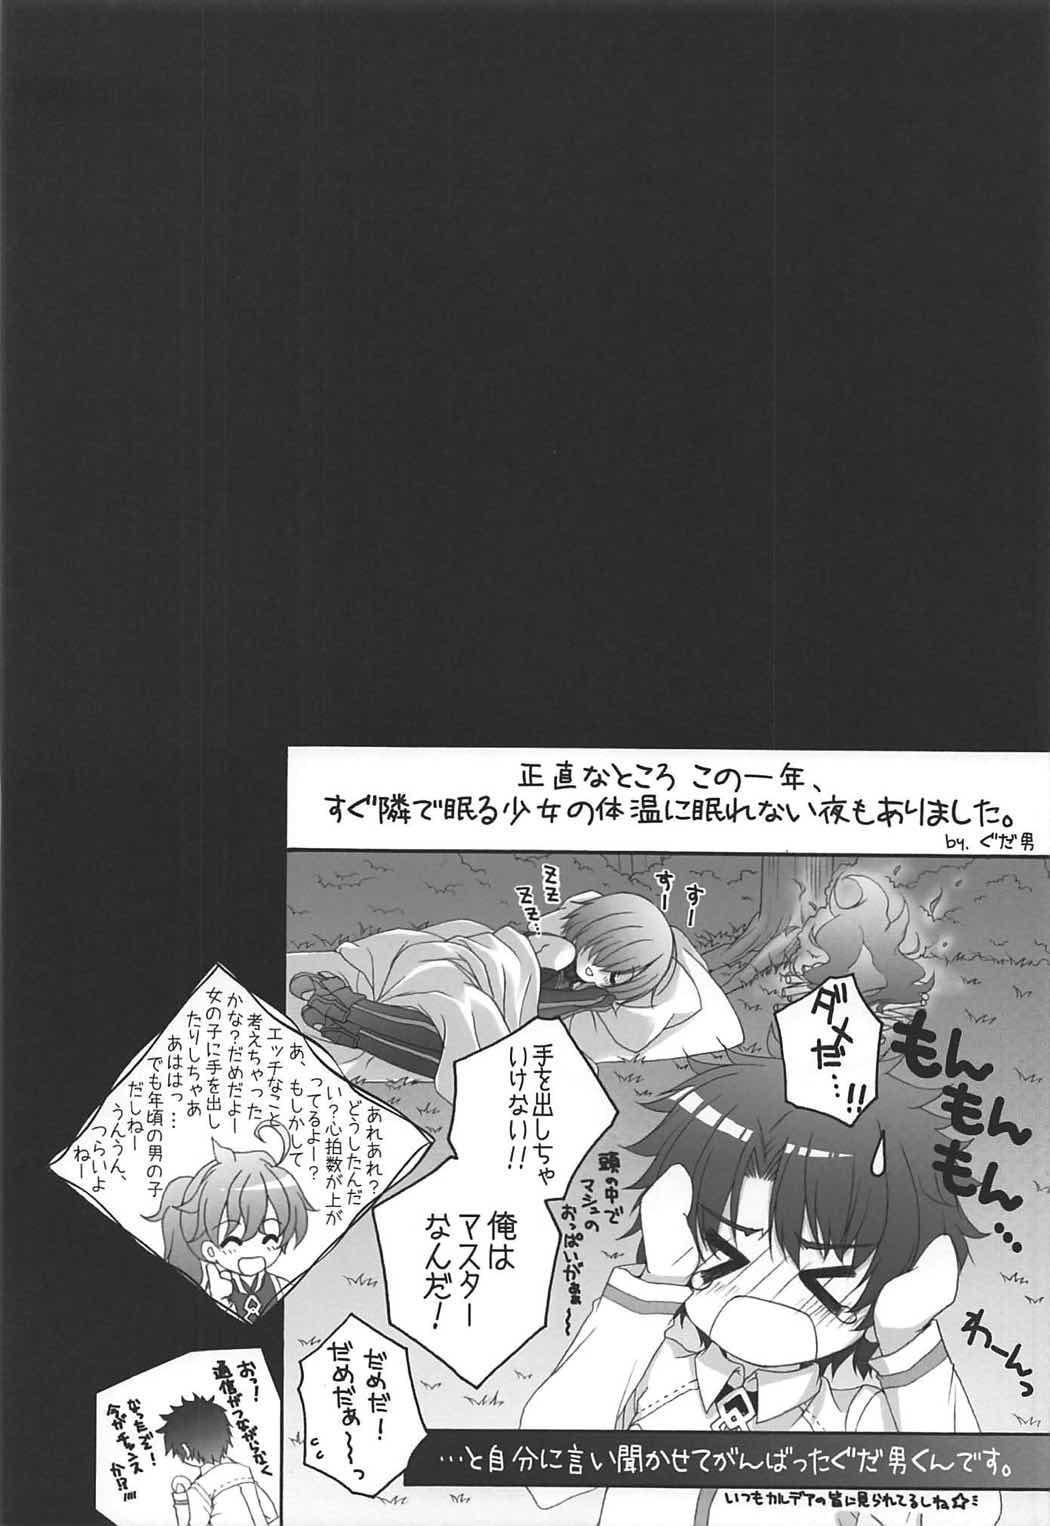 (COMIC1☆11) [Pyonpyororin (Akoko.)] - 1 day ago - (Fate/Grand Order) 2